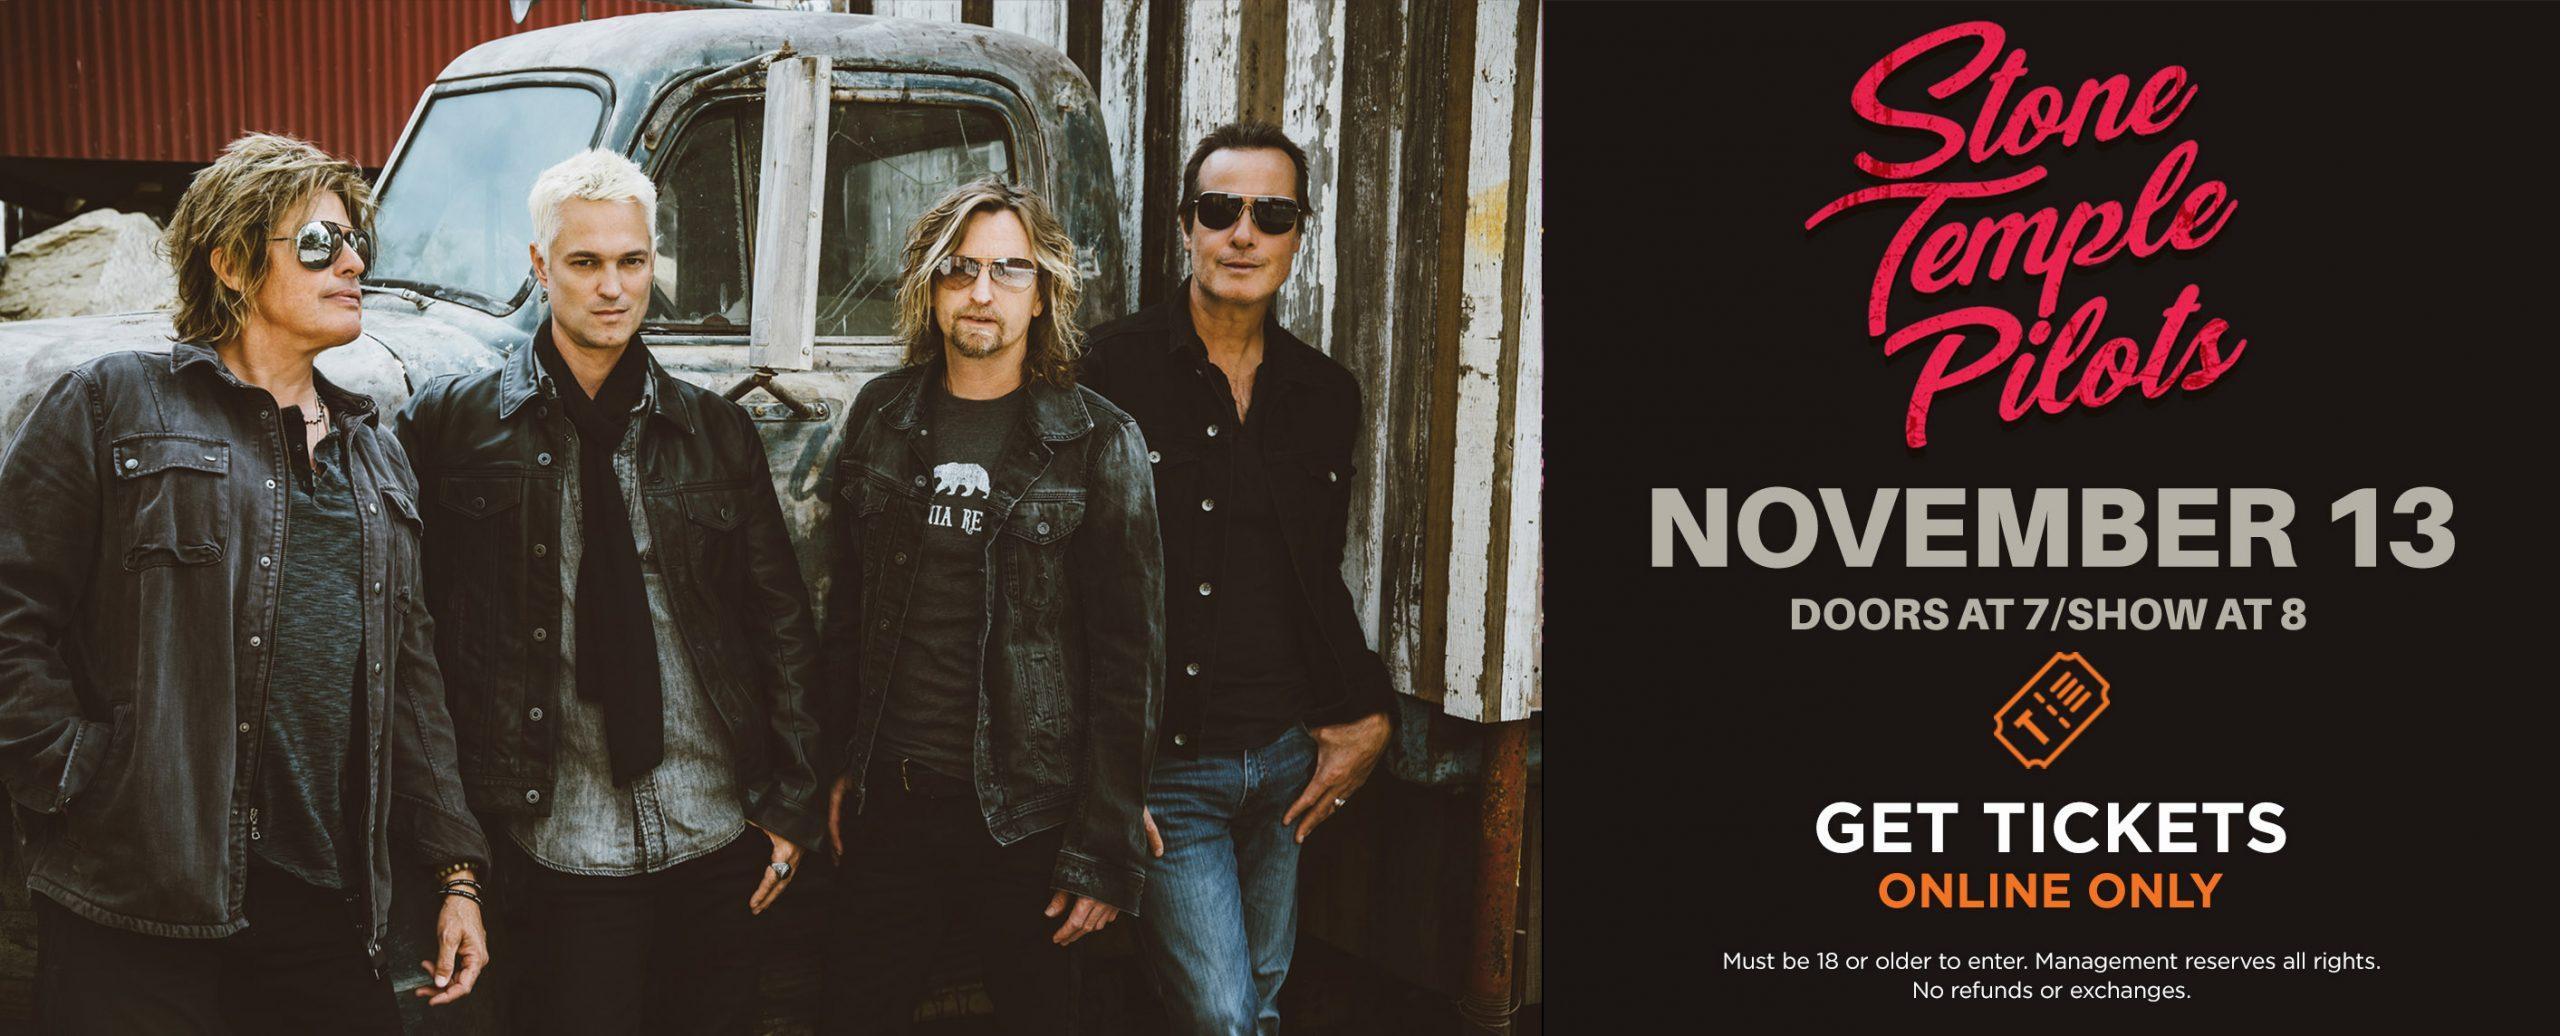 Stone Temple Pilots - Nov 13, 2021 | Doors open 7pm, Show starts 8pm